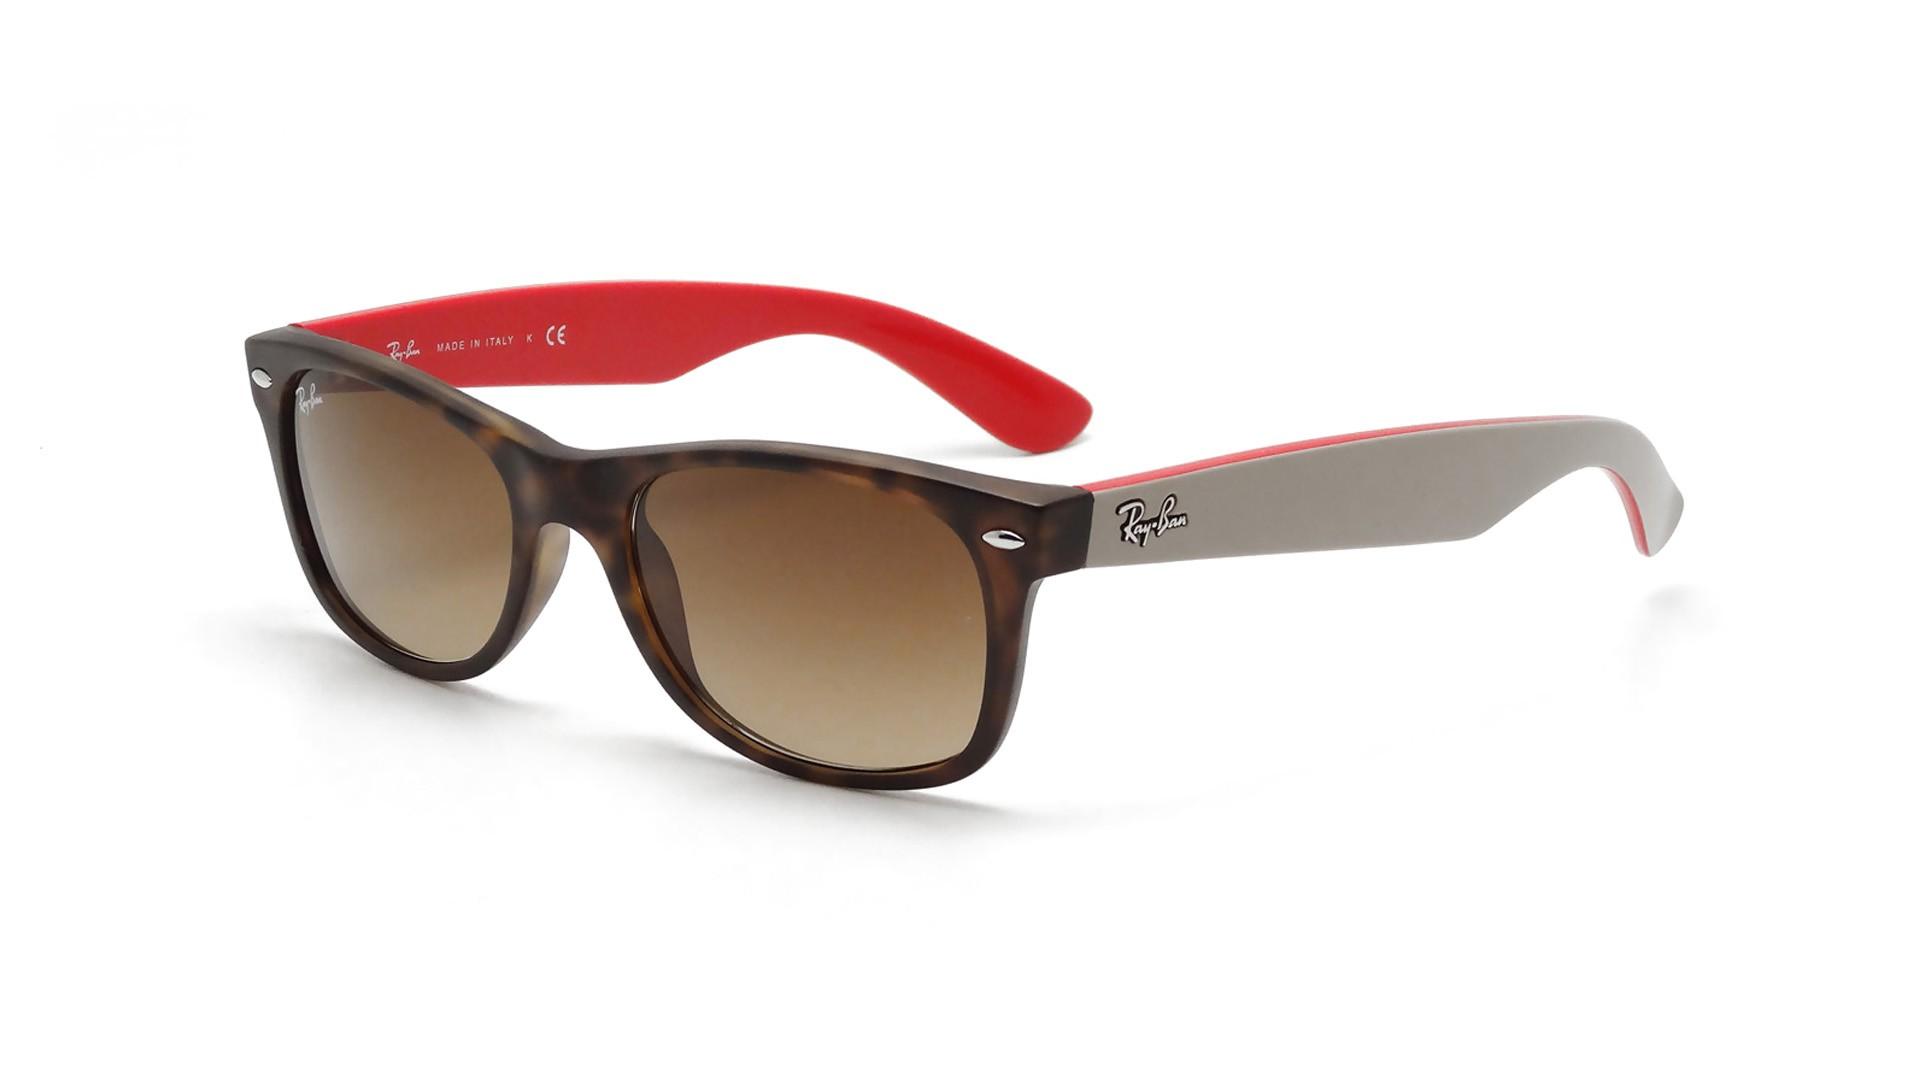 40652b87085 Sunglasses Ray-Ban New Wayfarer Tortoise RB2132 6181 85 52-18 Medium